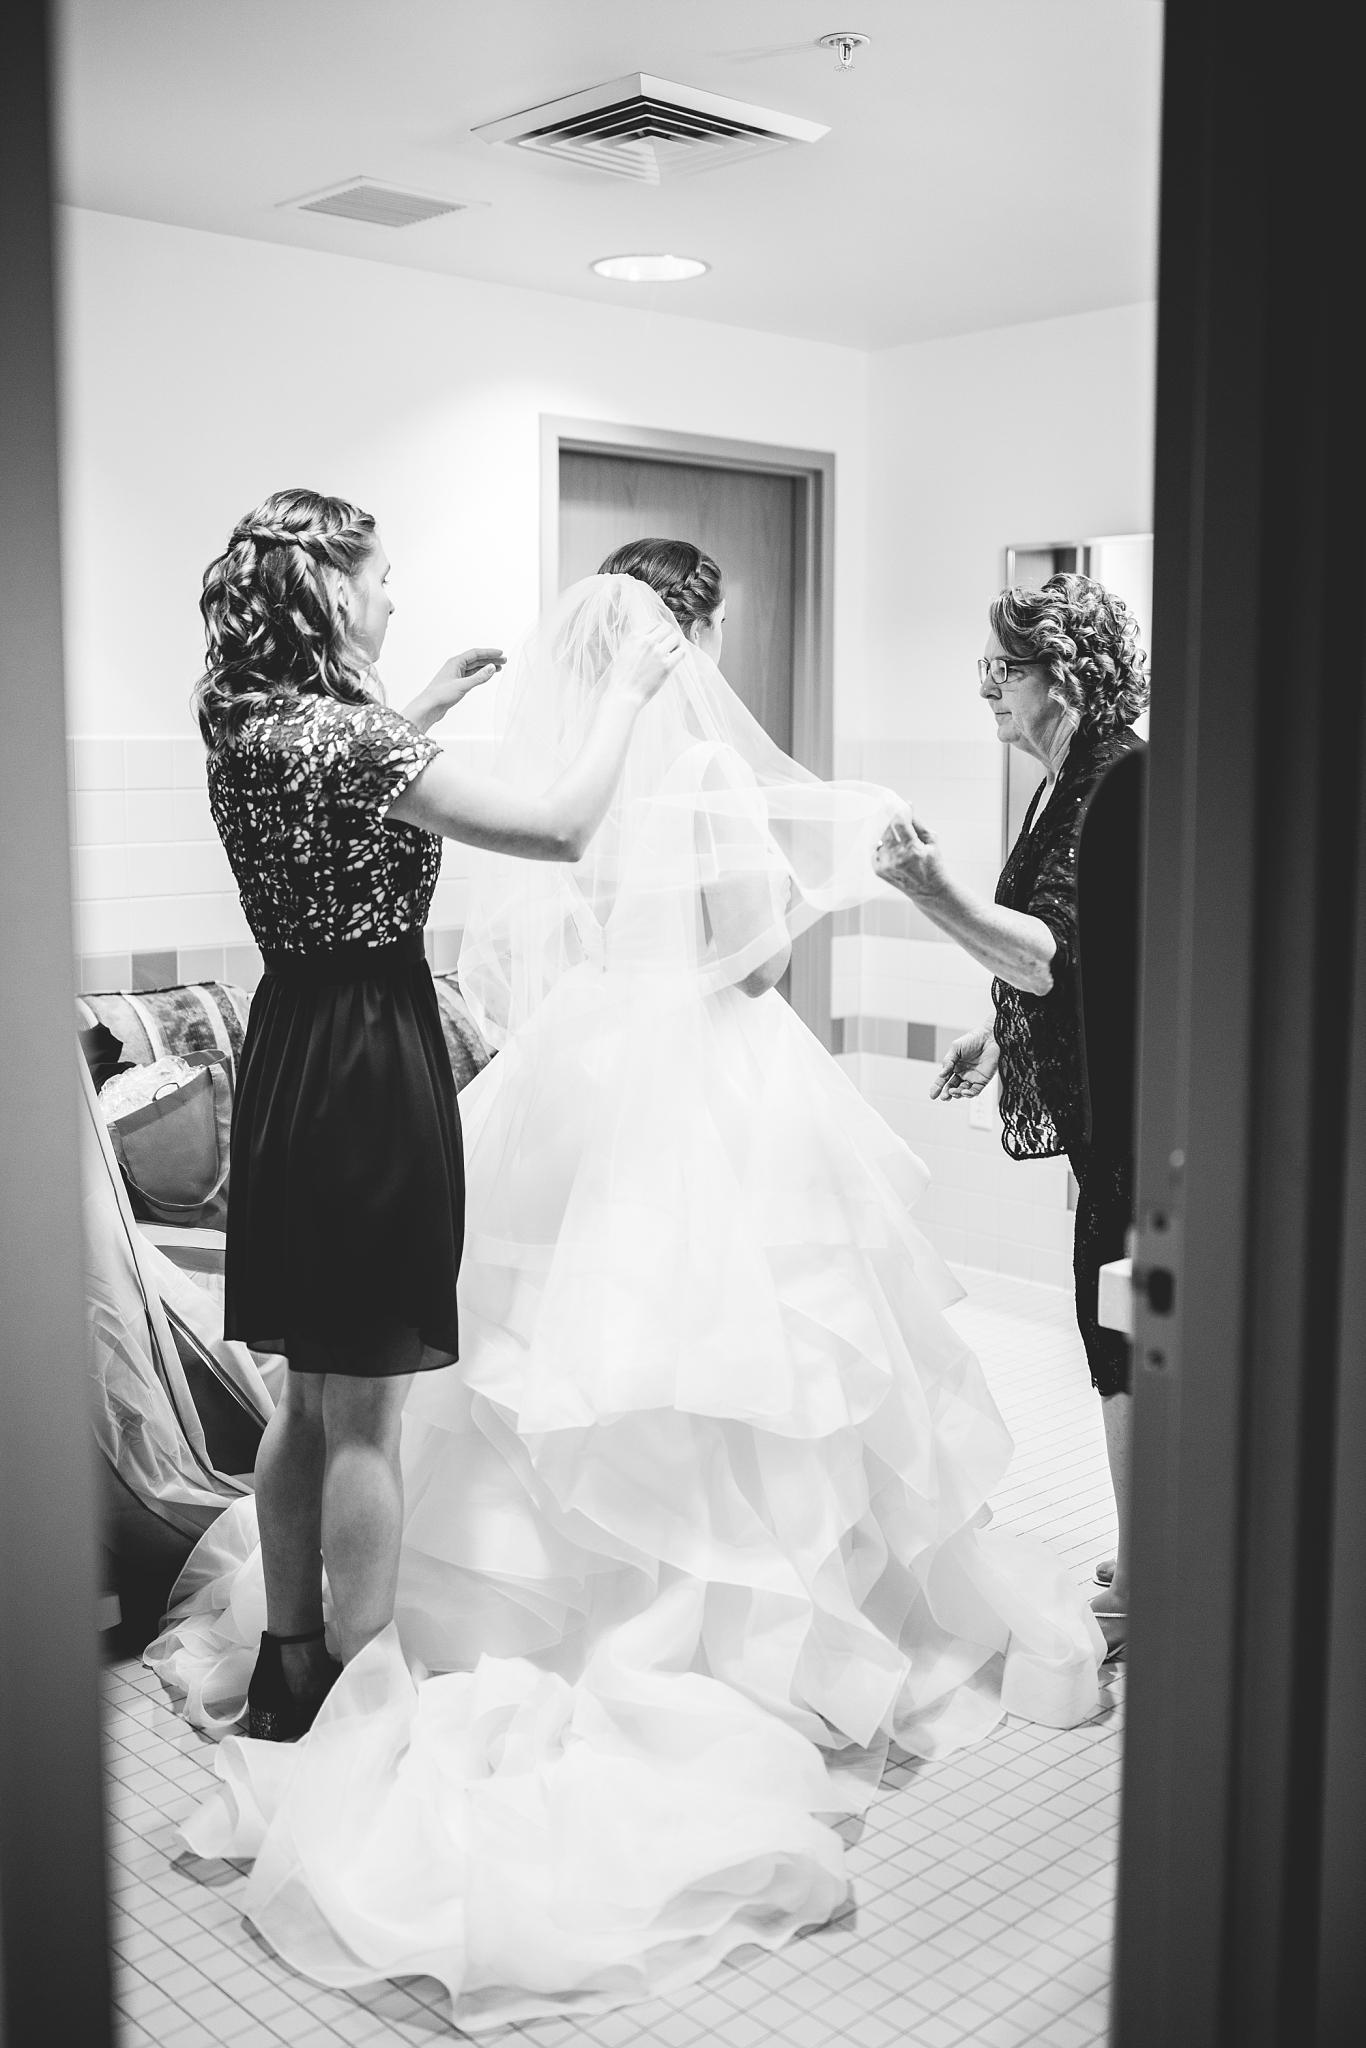 CN-Wedding-21-BW_Lizzie-B-Imagery-Utah-Wedding-Photographer-Blessed-Sacrament-Catholic-Church-Sandy-Utah-The-Blended-Table-Salt-Lake-City.jpg